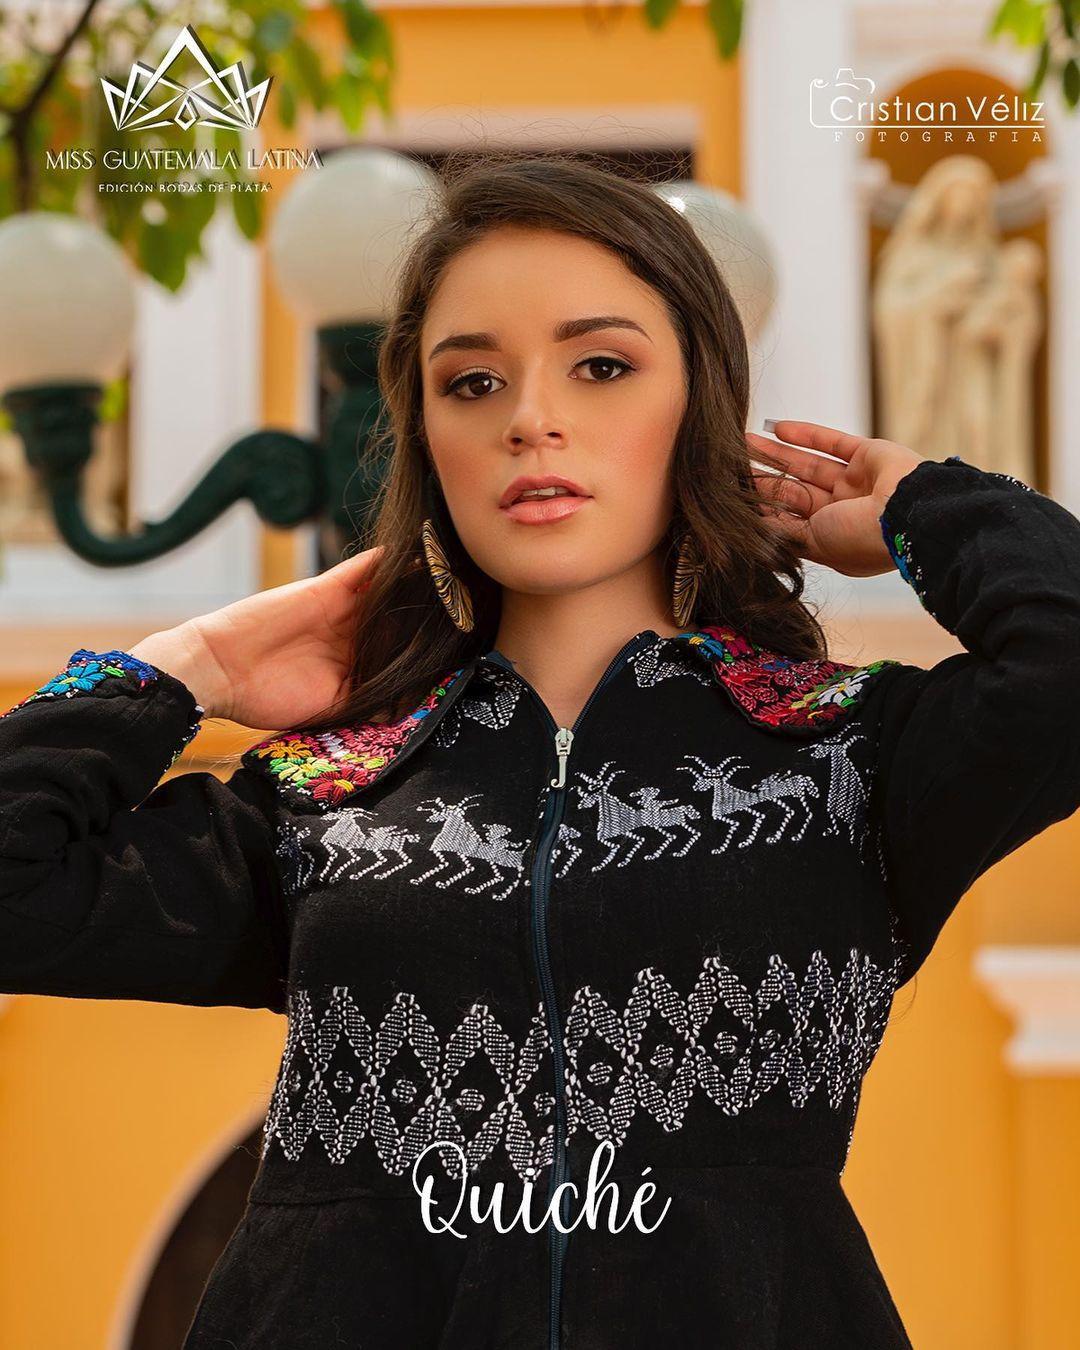 candidatas a miss guatemala latina 2021. final: 30 de abril. - Página 2 B2g4pI